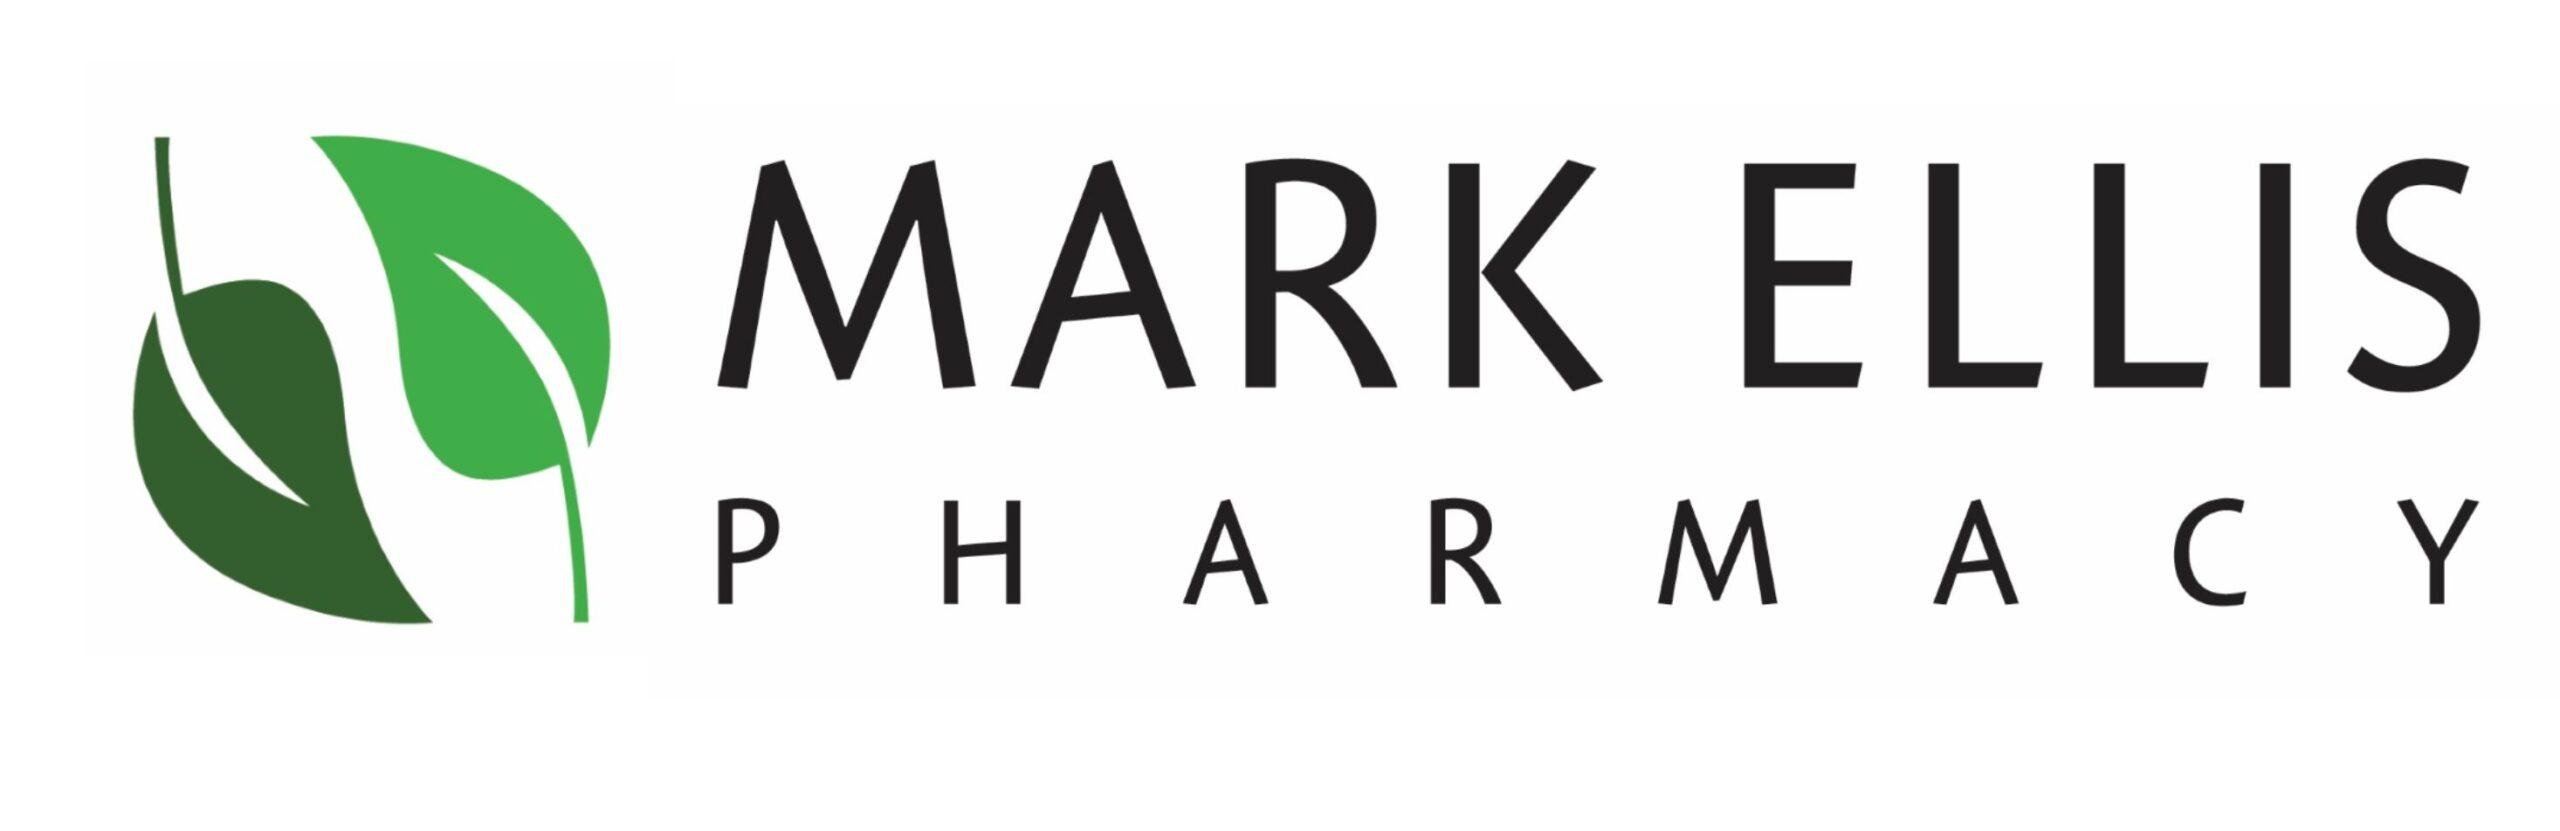 Mark Ellis Pharmacy